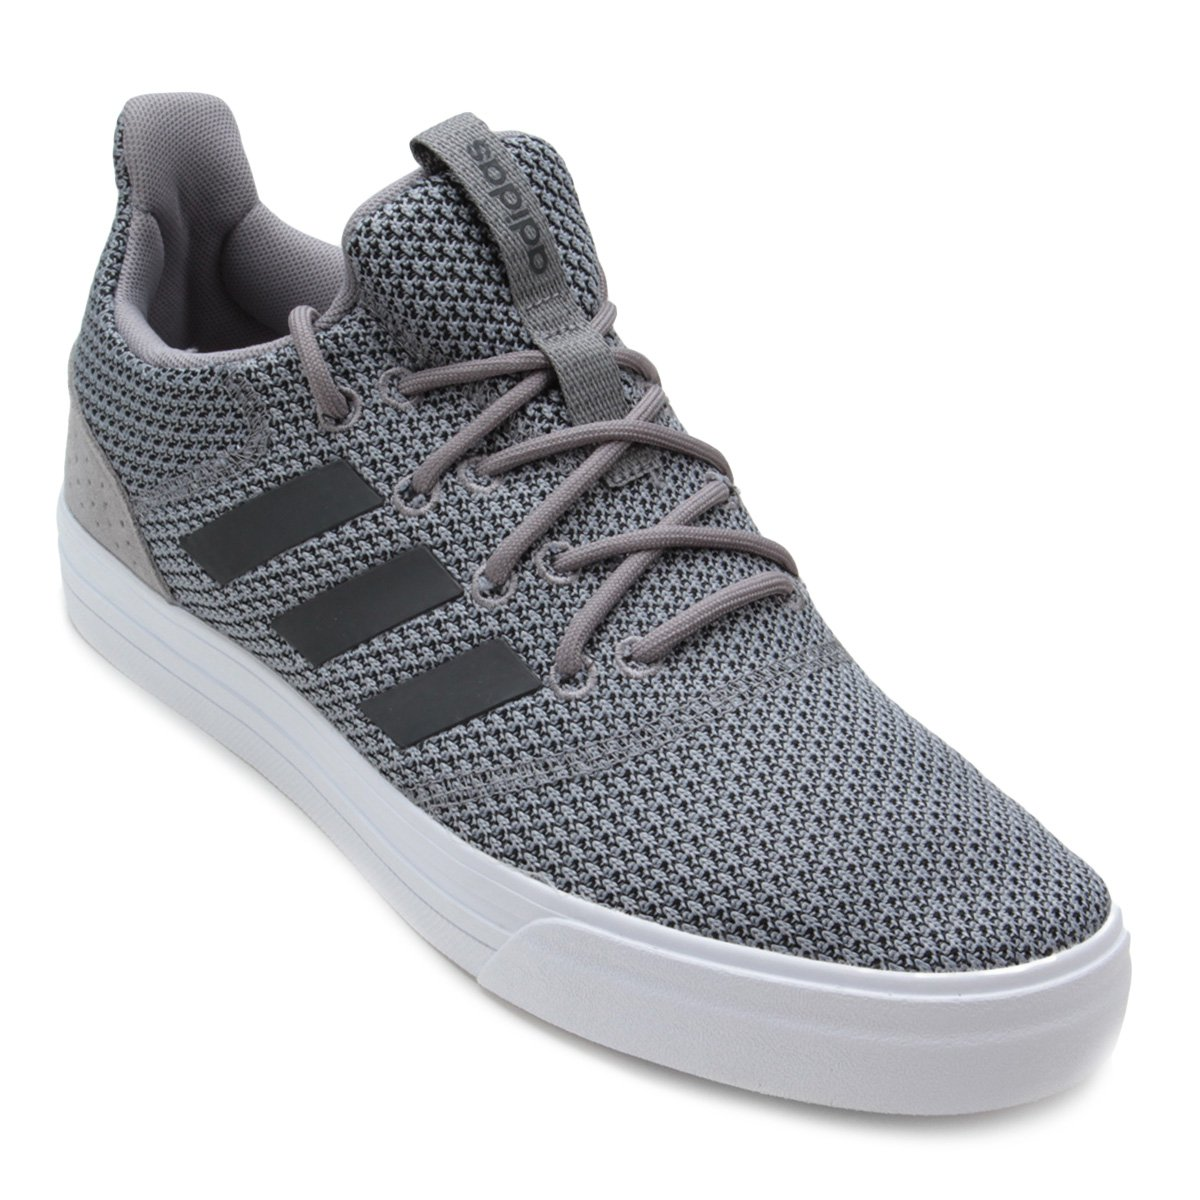 Adidas Tênis Masculino True Chumbo Street edrxCBWo